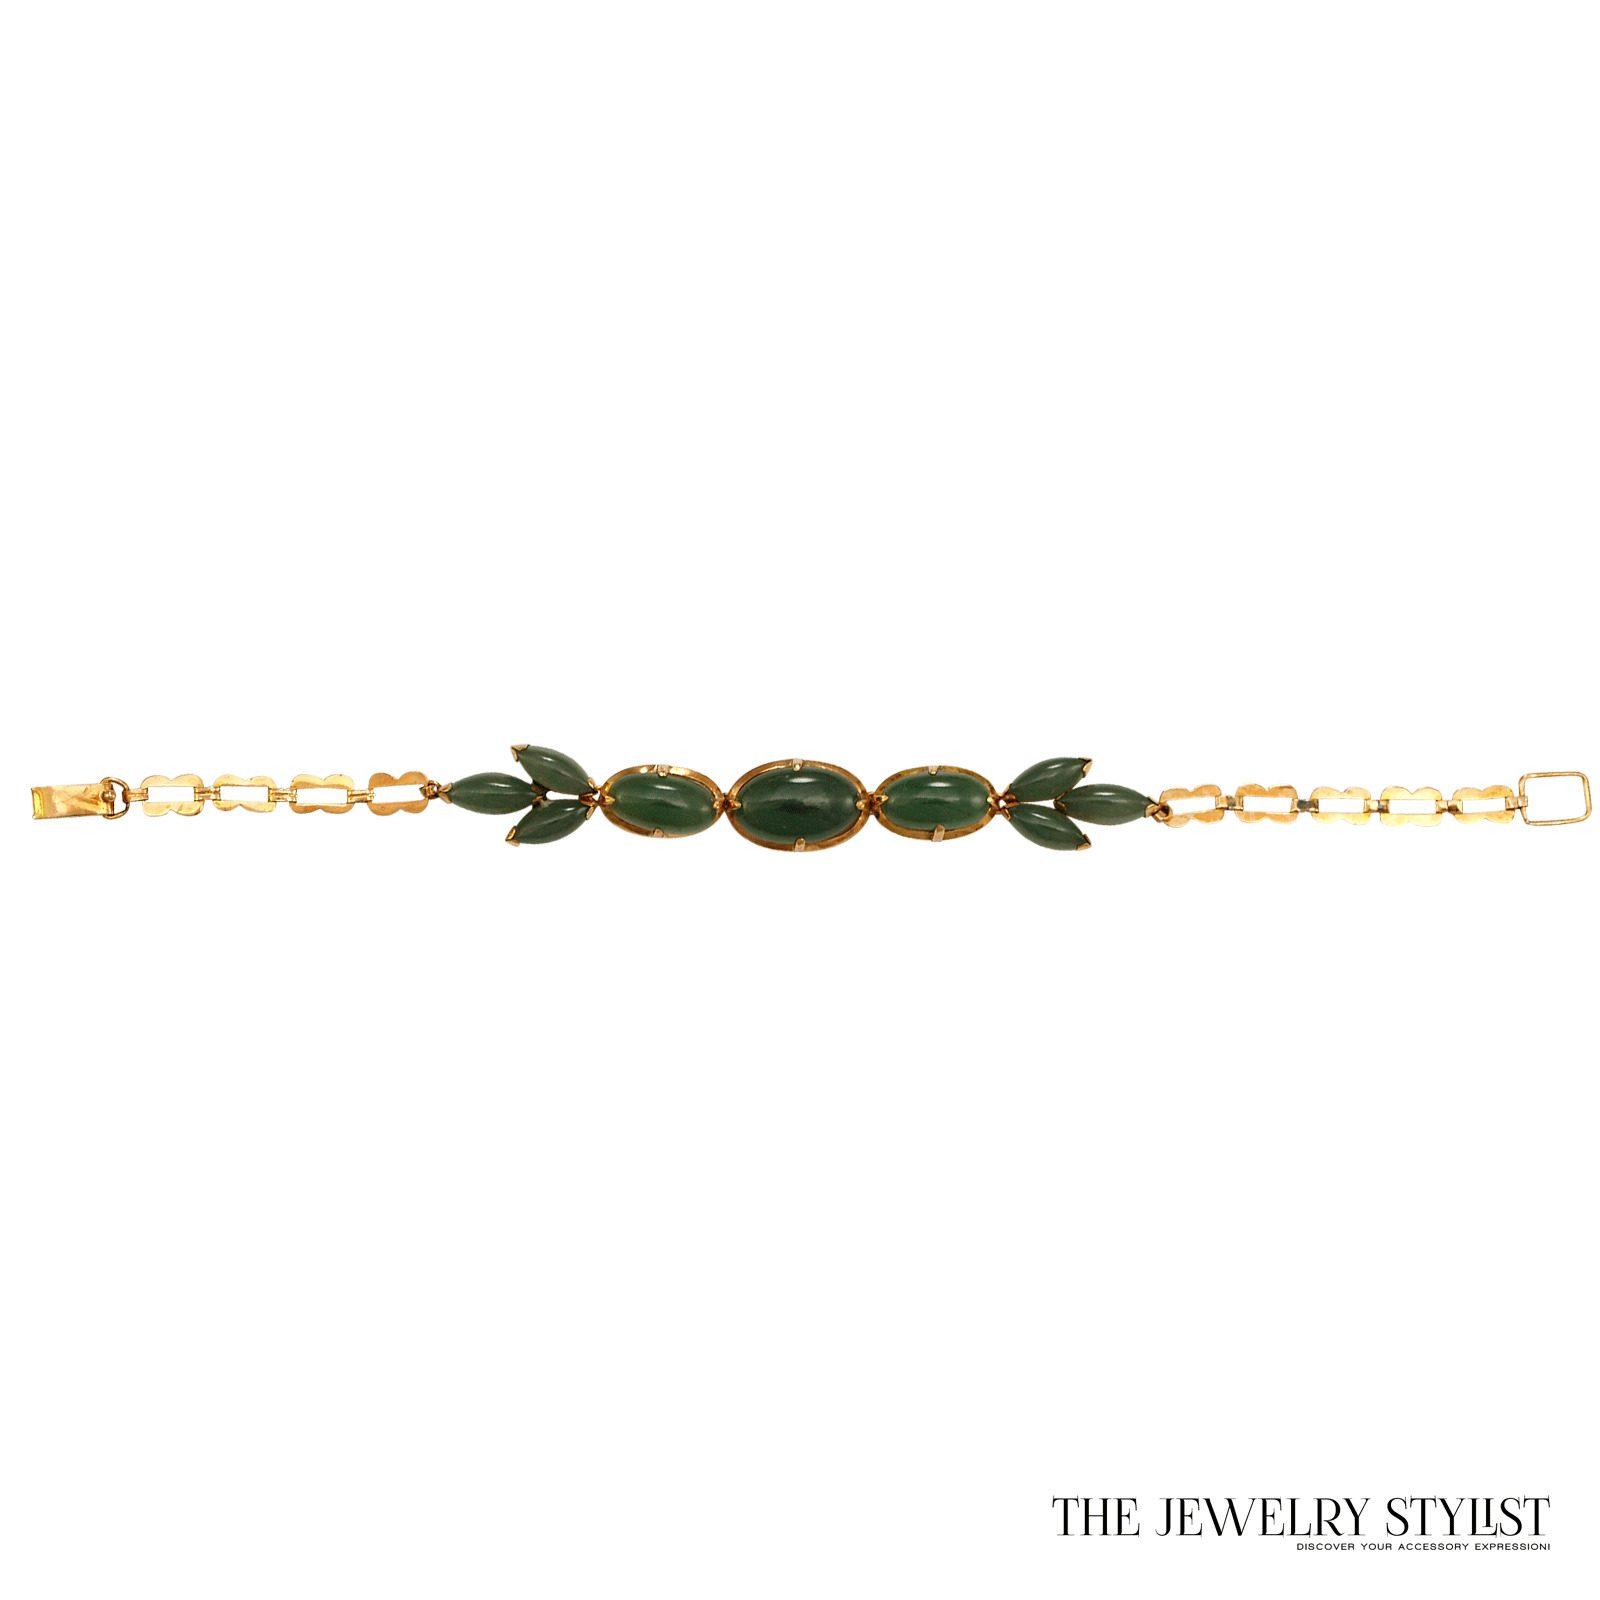 Vintage 14k Caribe Genuine Jade Bracelet